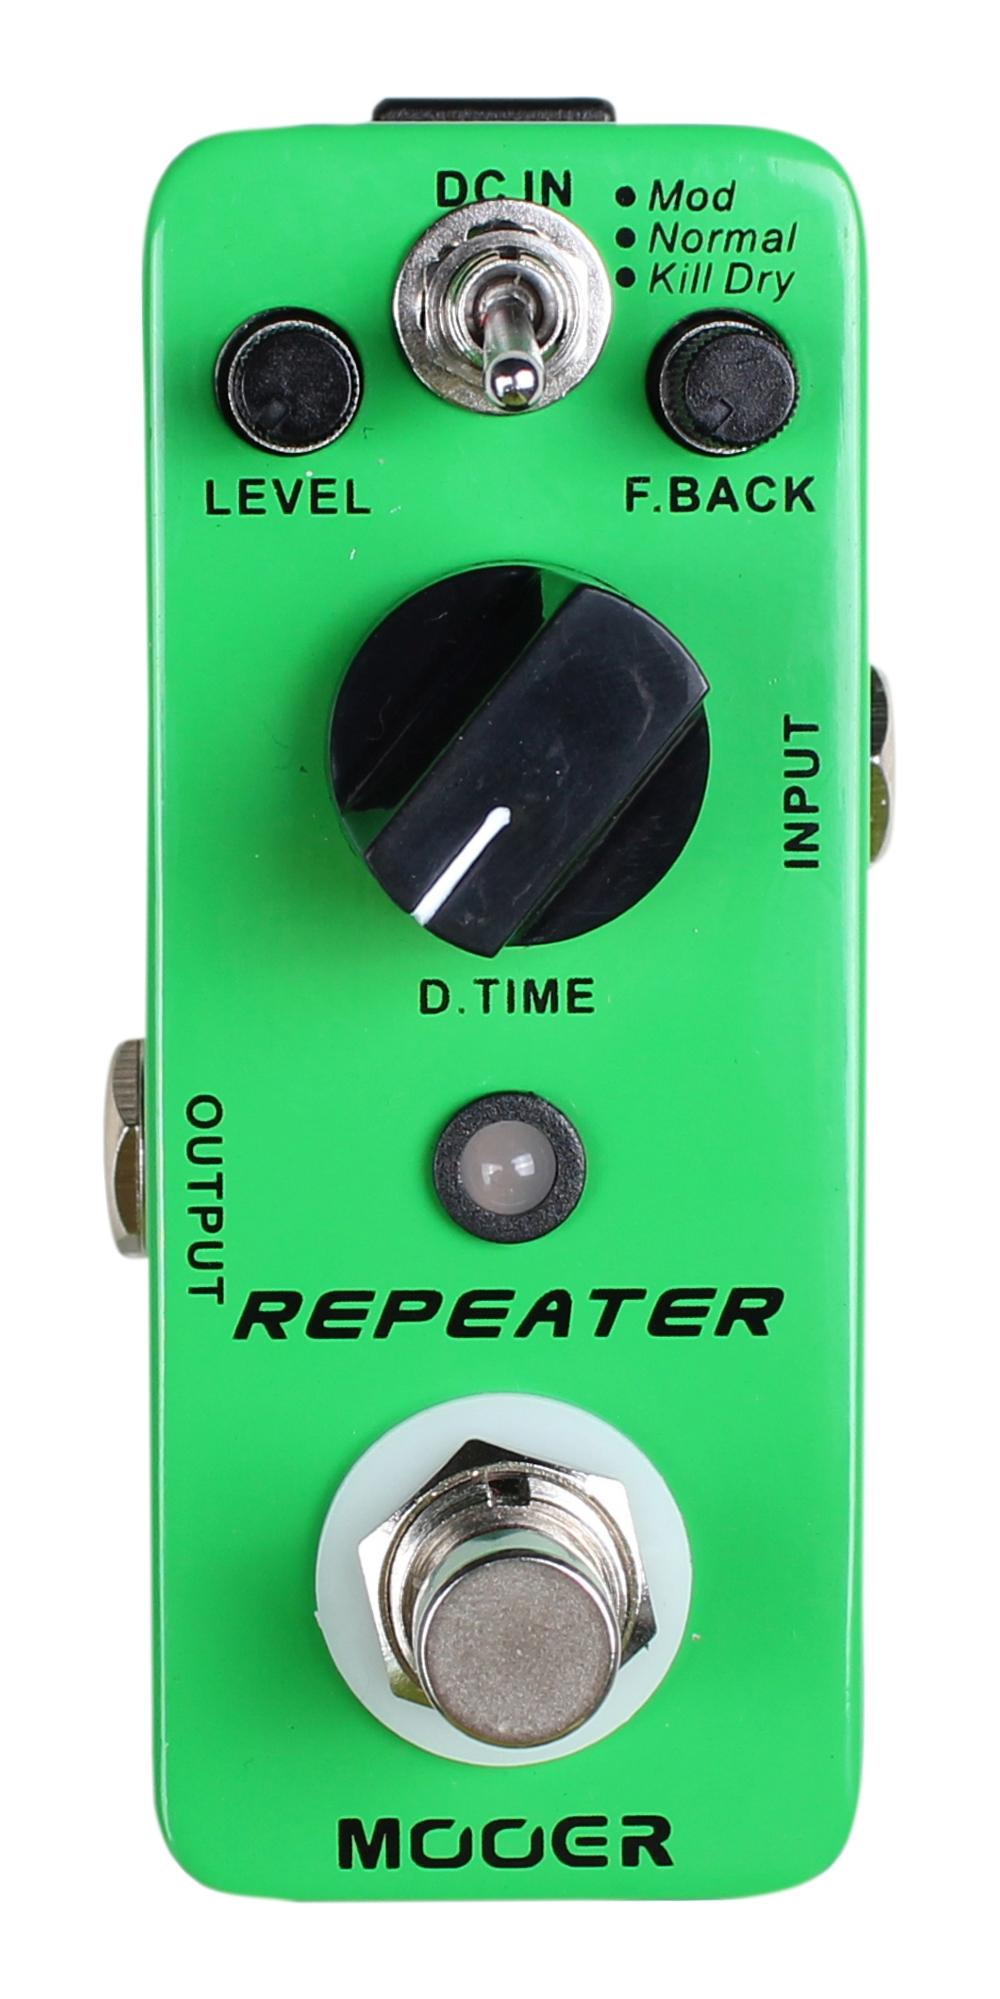 mooer repeater digital delay guitar effects pedal ebay. Black Bedroom Furniture Sets. Home Design Ideas